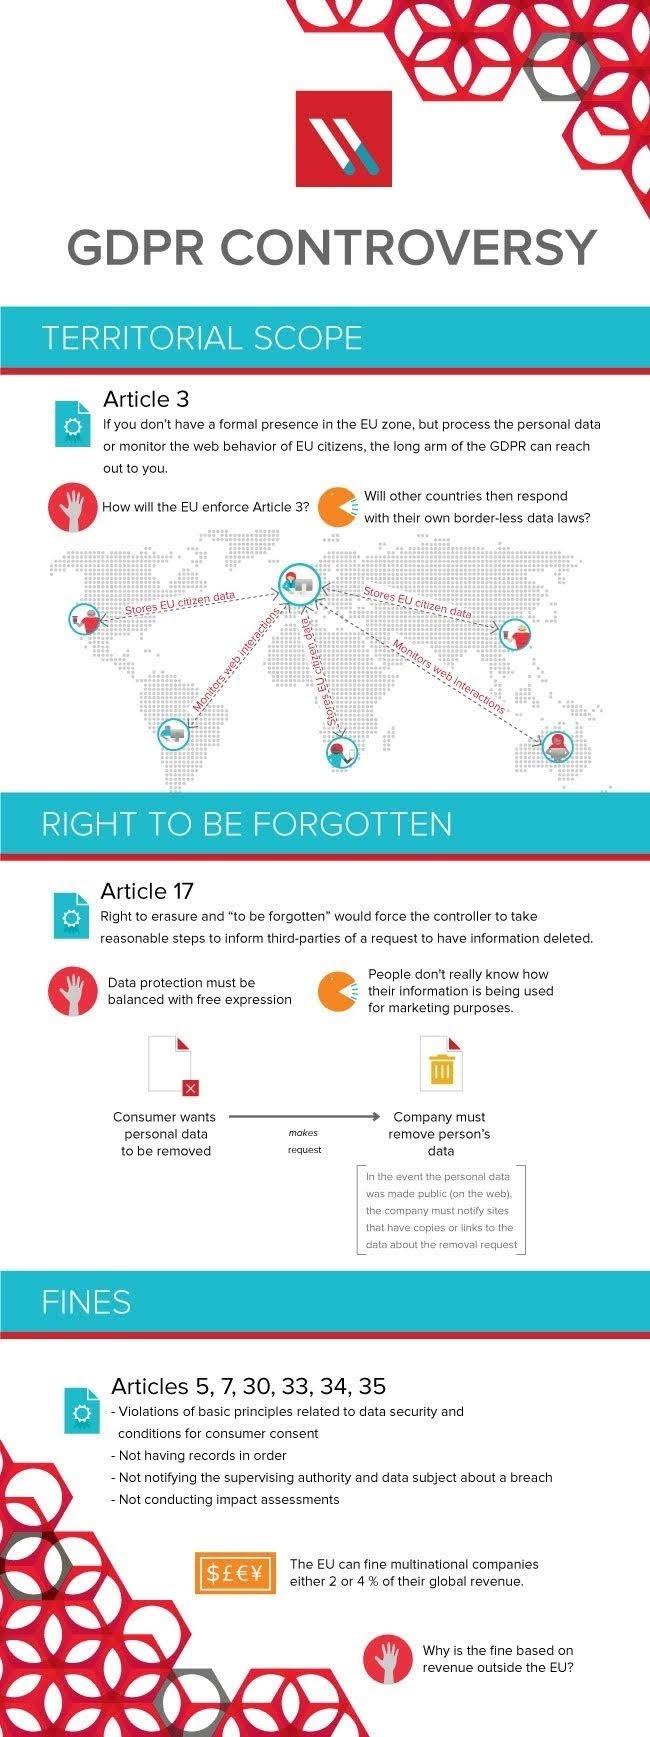 Controversies between the EU GDPR #infographic